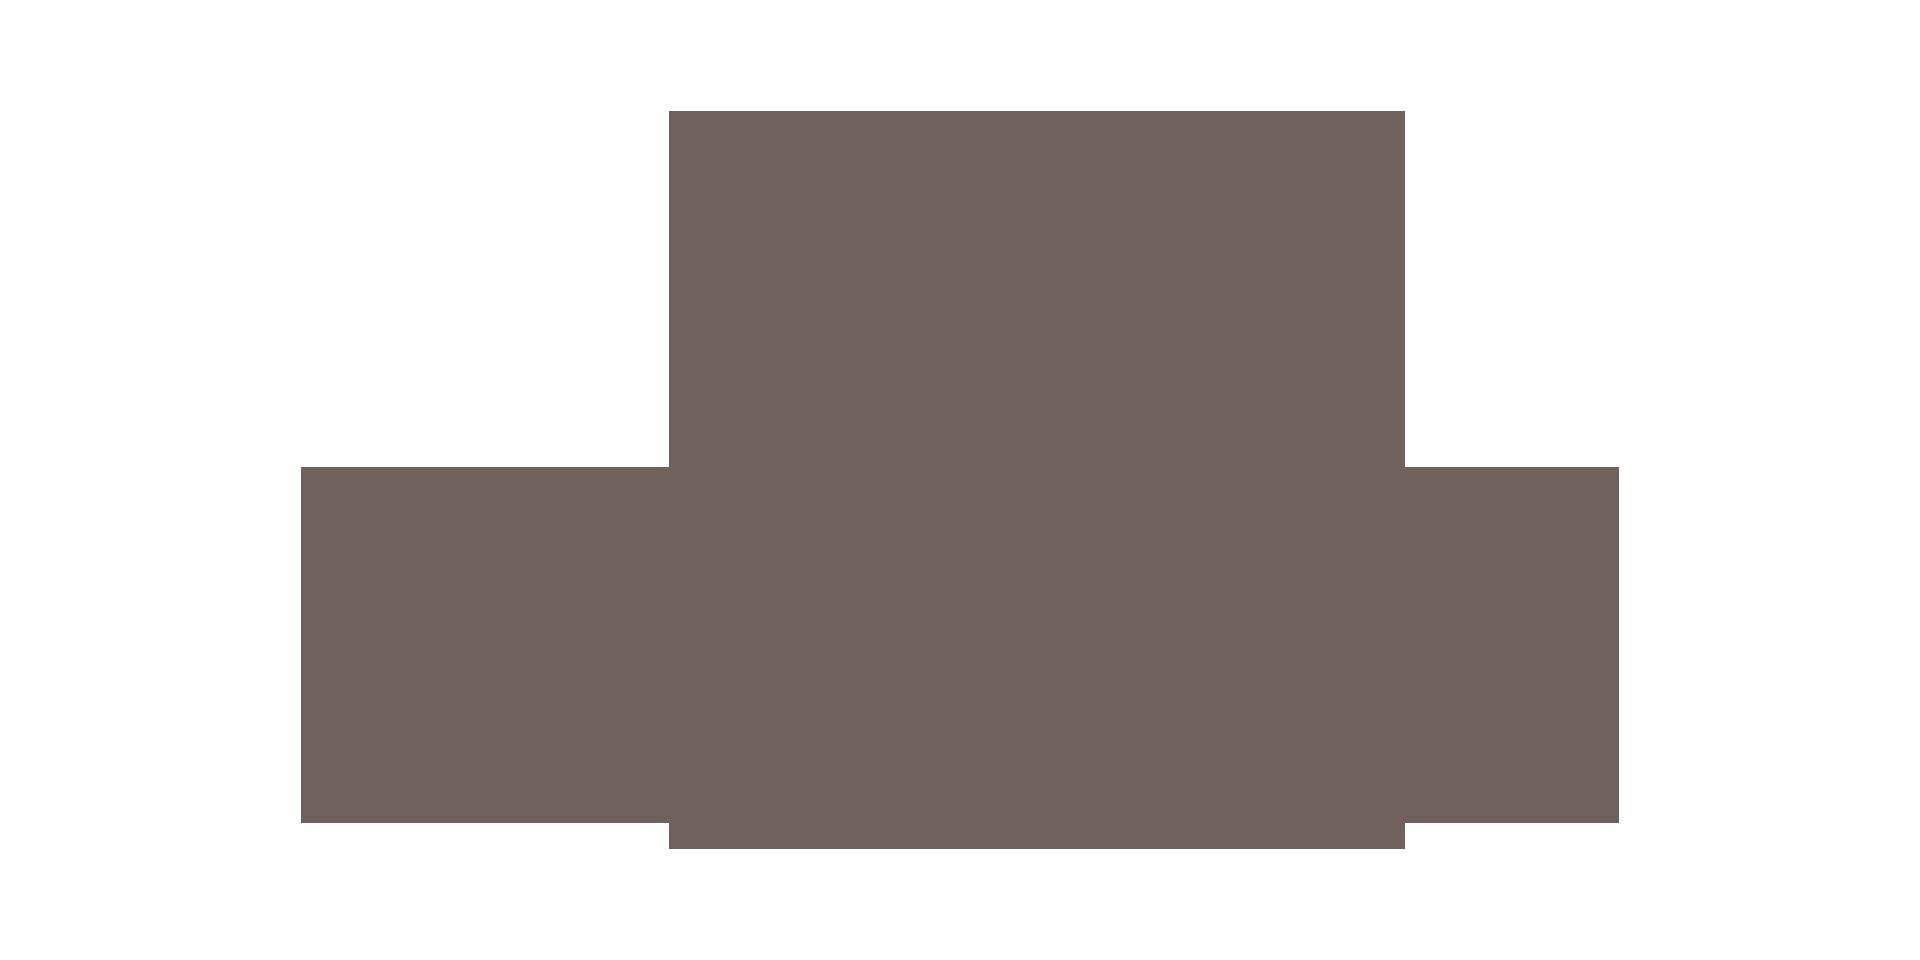 La marca Sheraton Hotel & Resorts renovó su logo